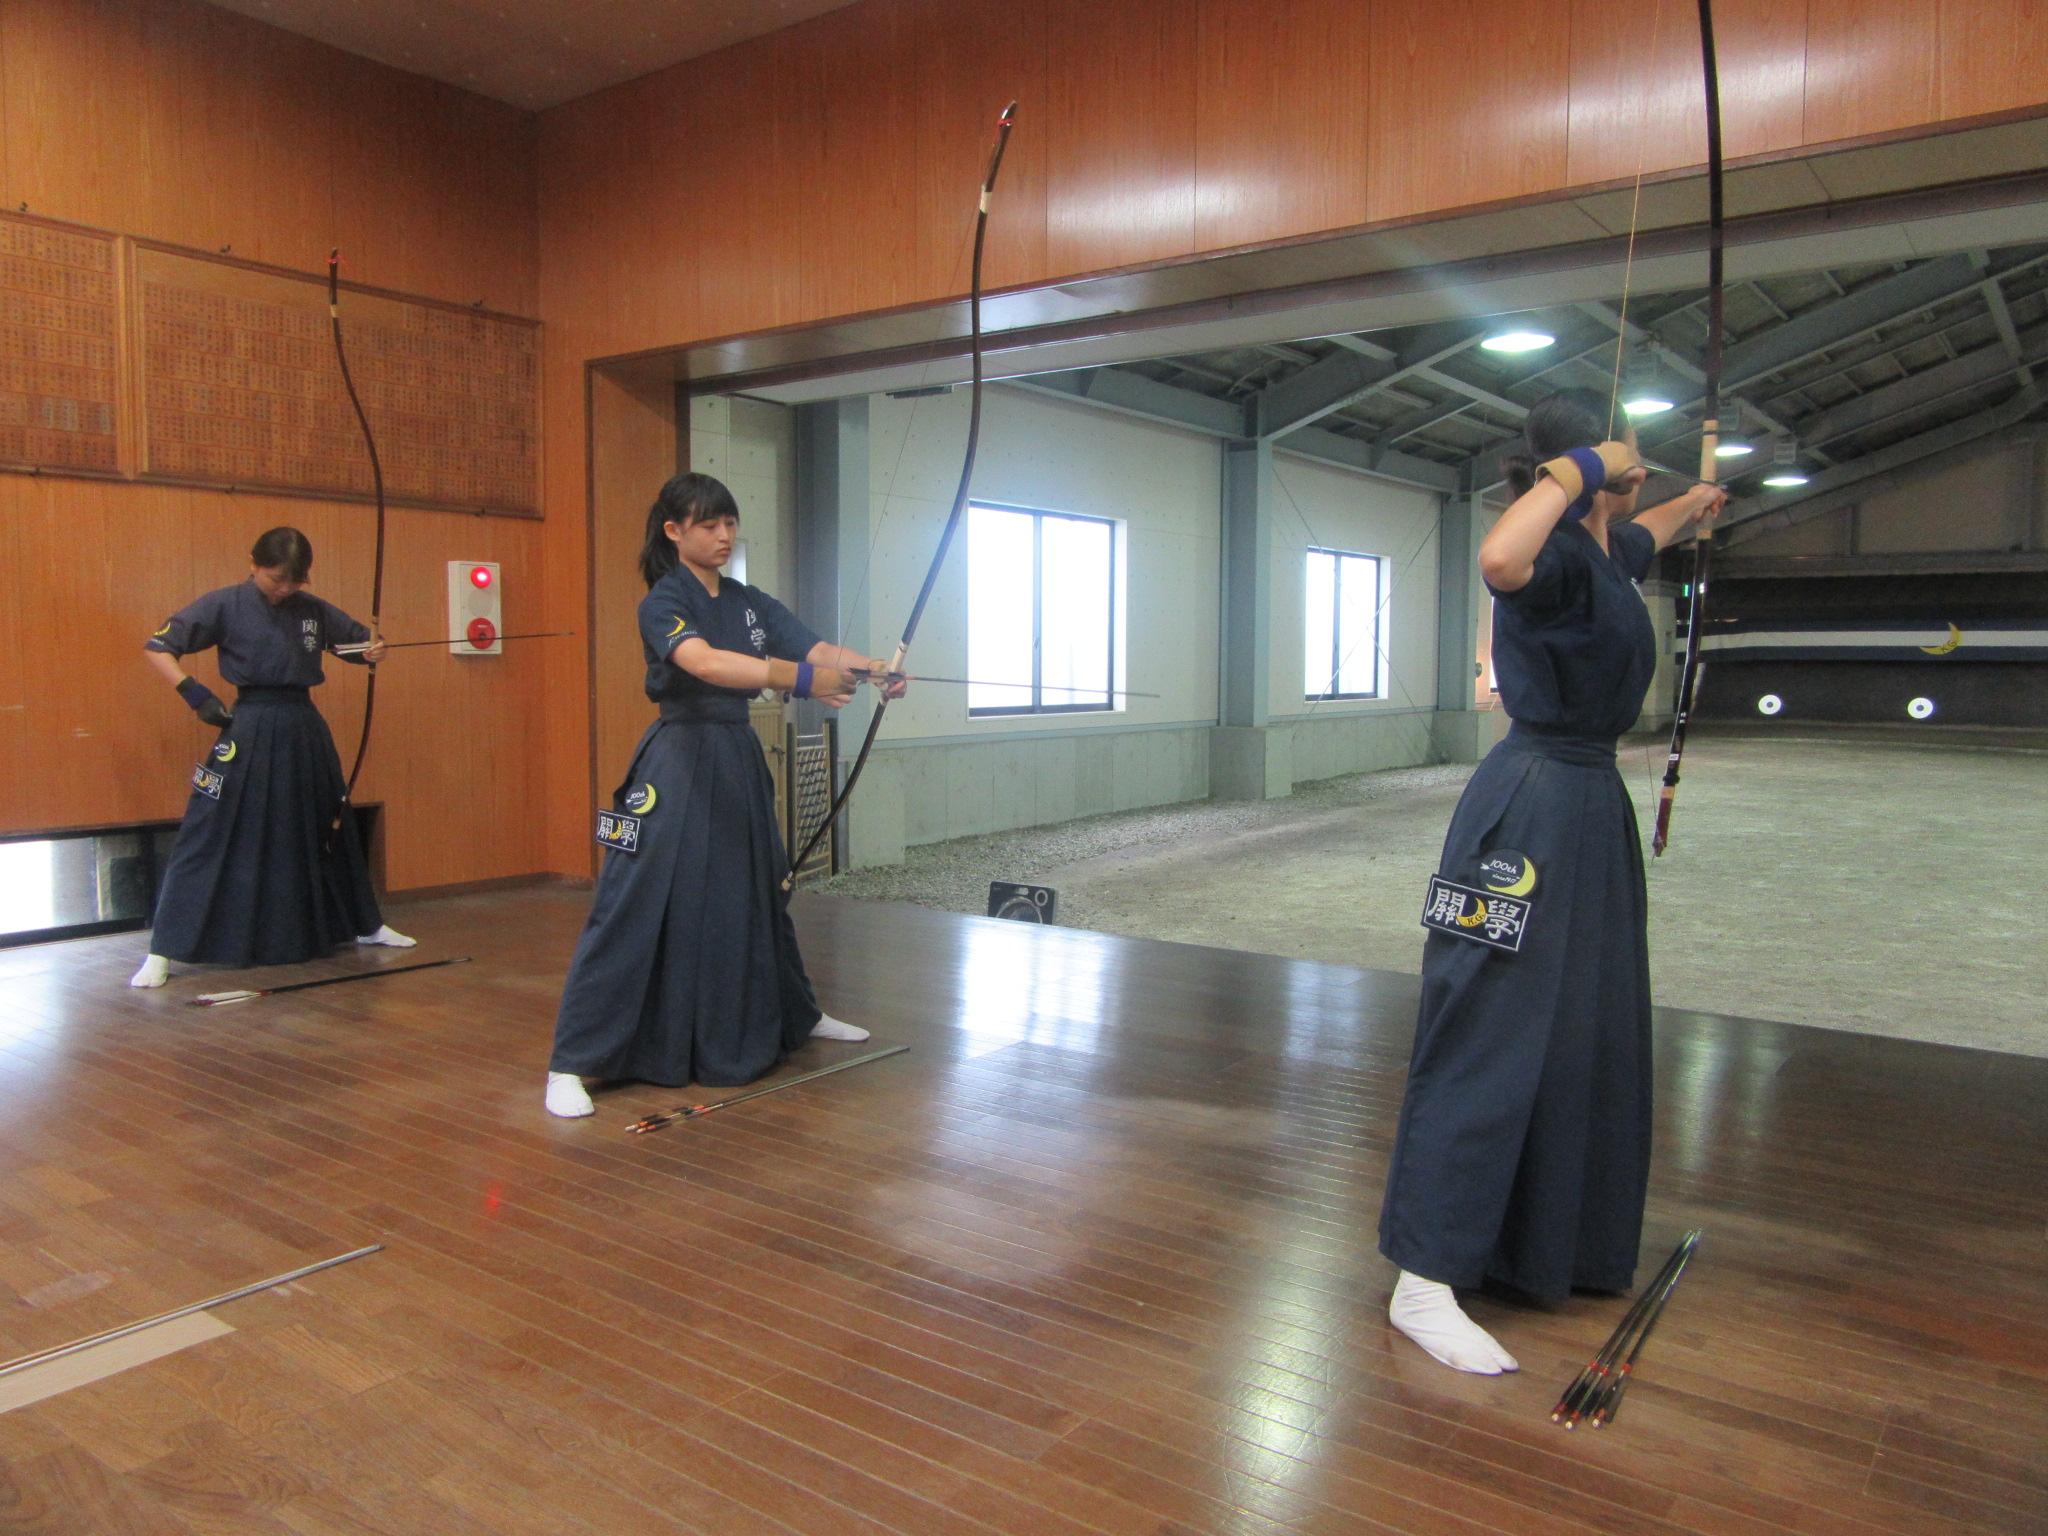 Bチーム 岡田真(2) 高谷(1) 石川(3)